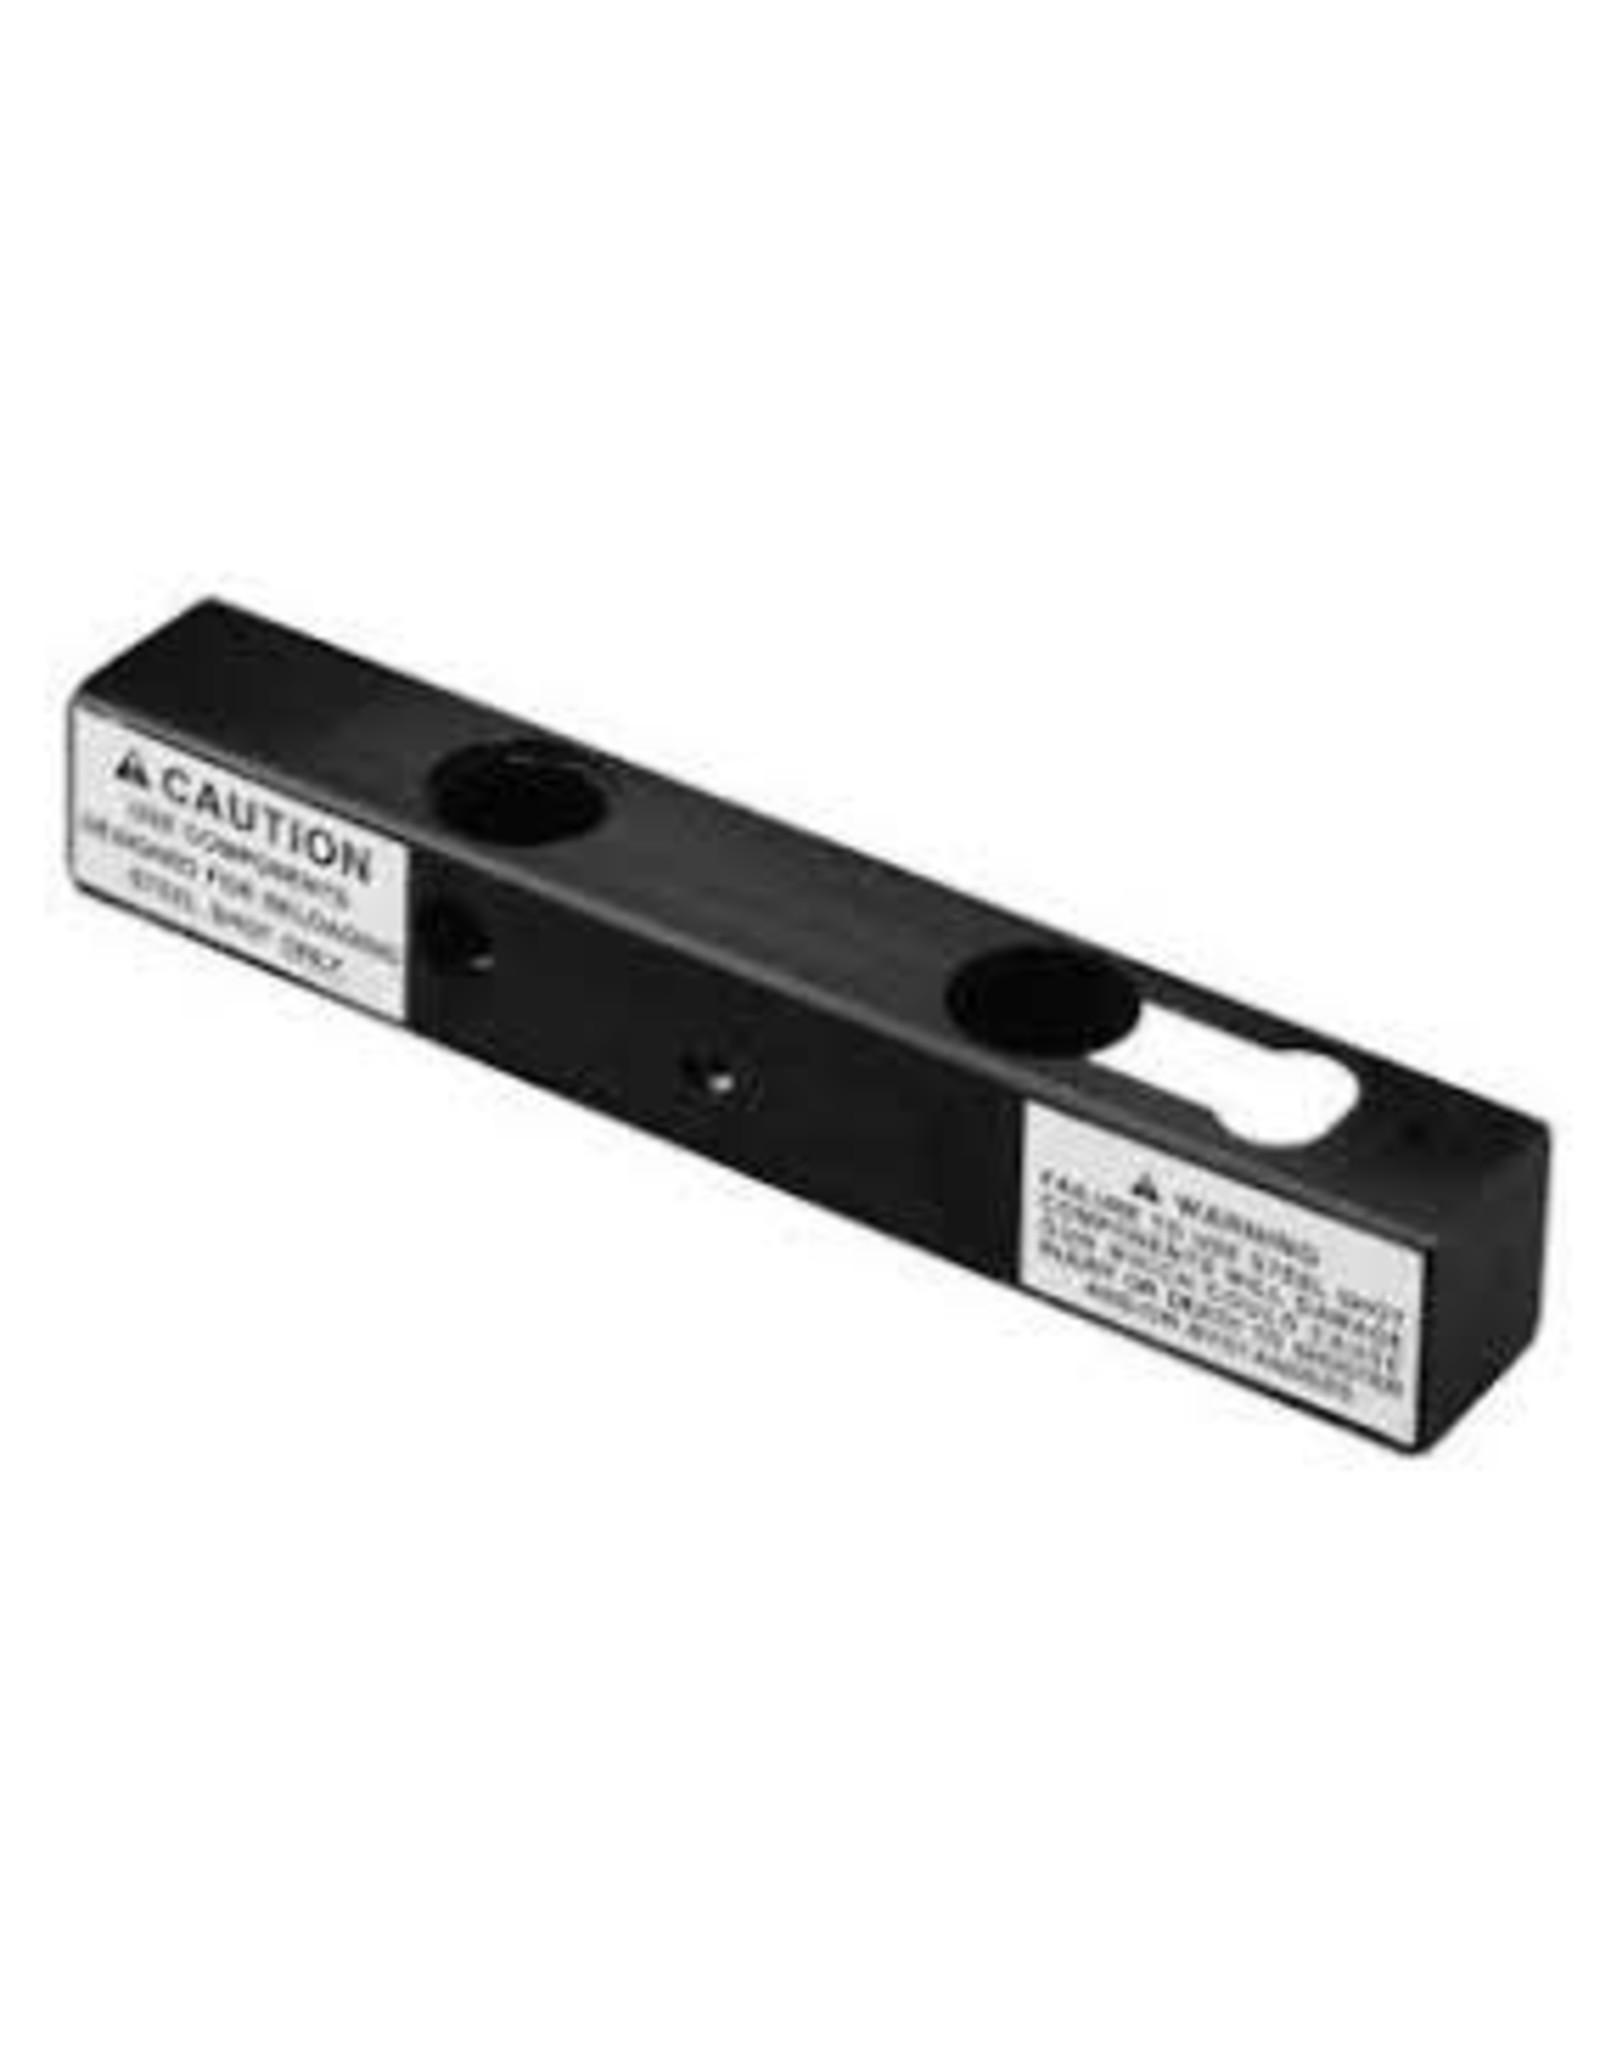 MEC MEC Steel Shot 302 Charge Bar  7/8 OZ. #1 - #4